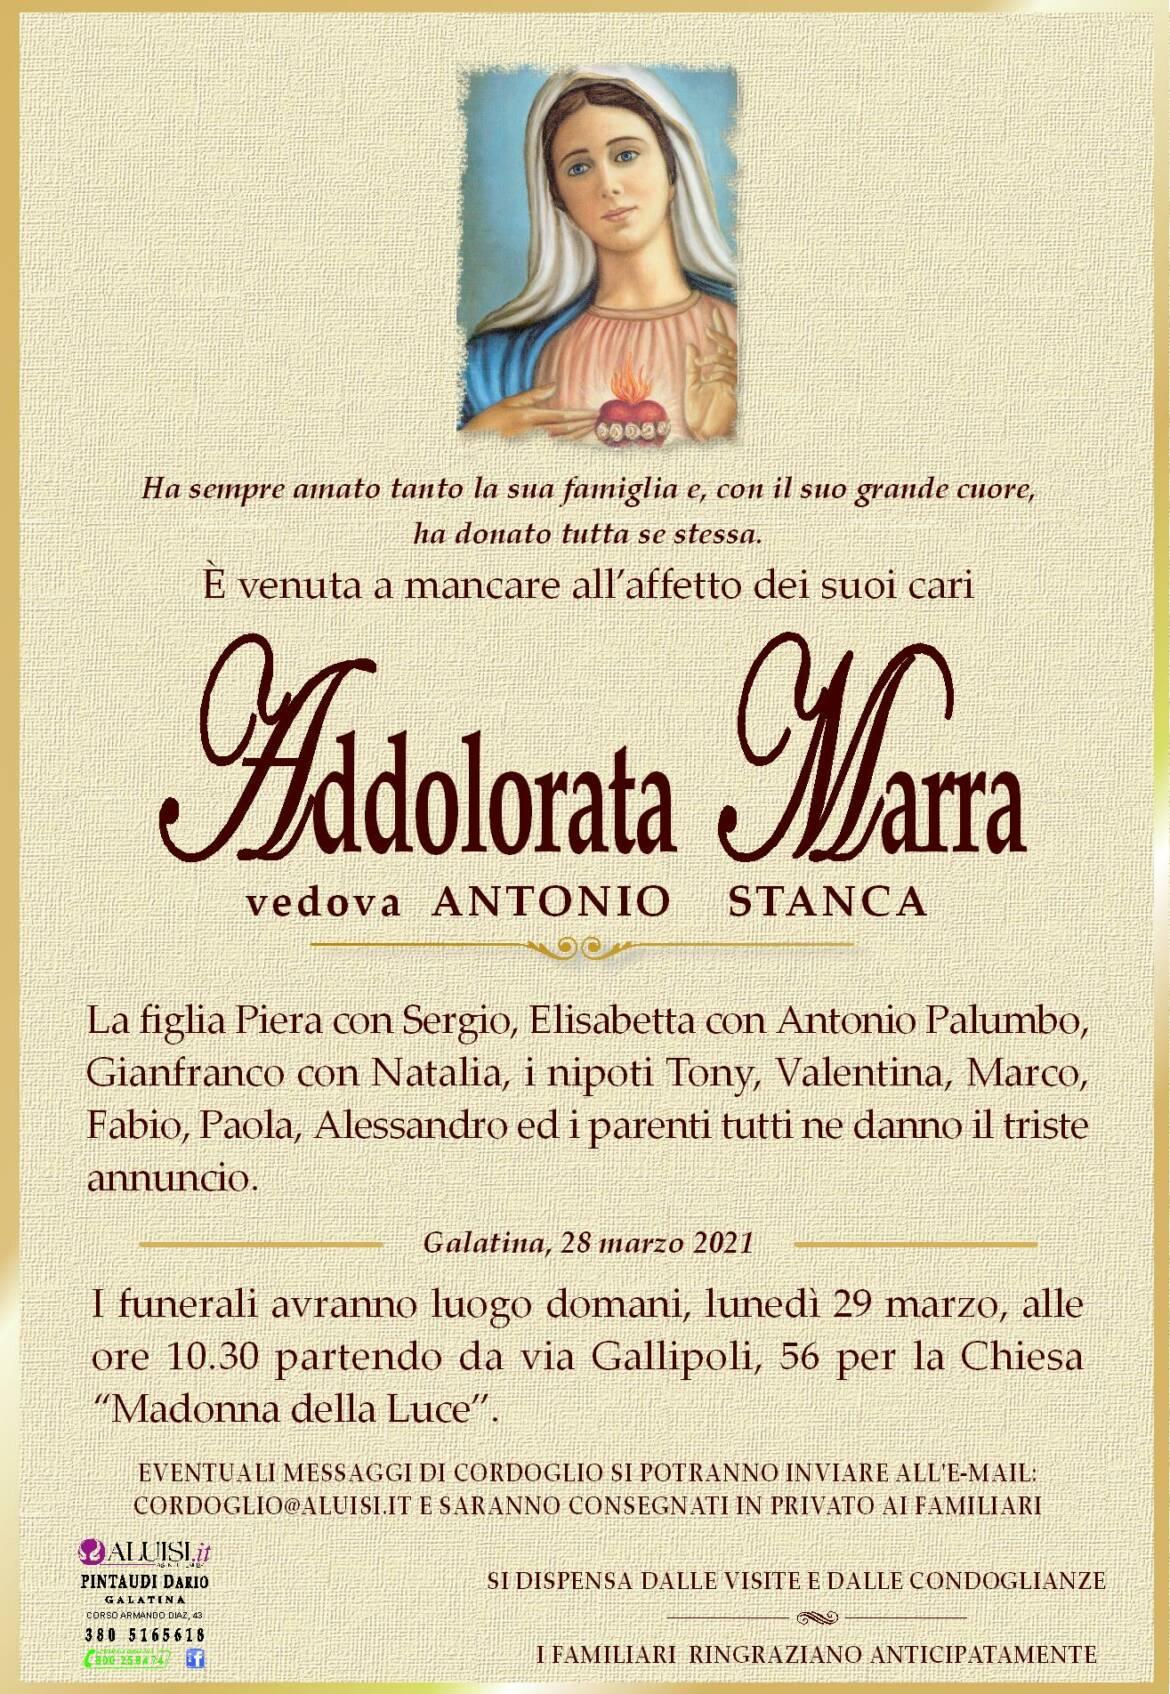 Annuncio-ADDOLORATA-MARRA-GALATINA.jpg